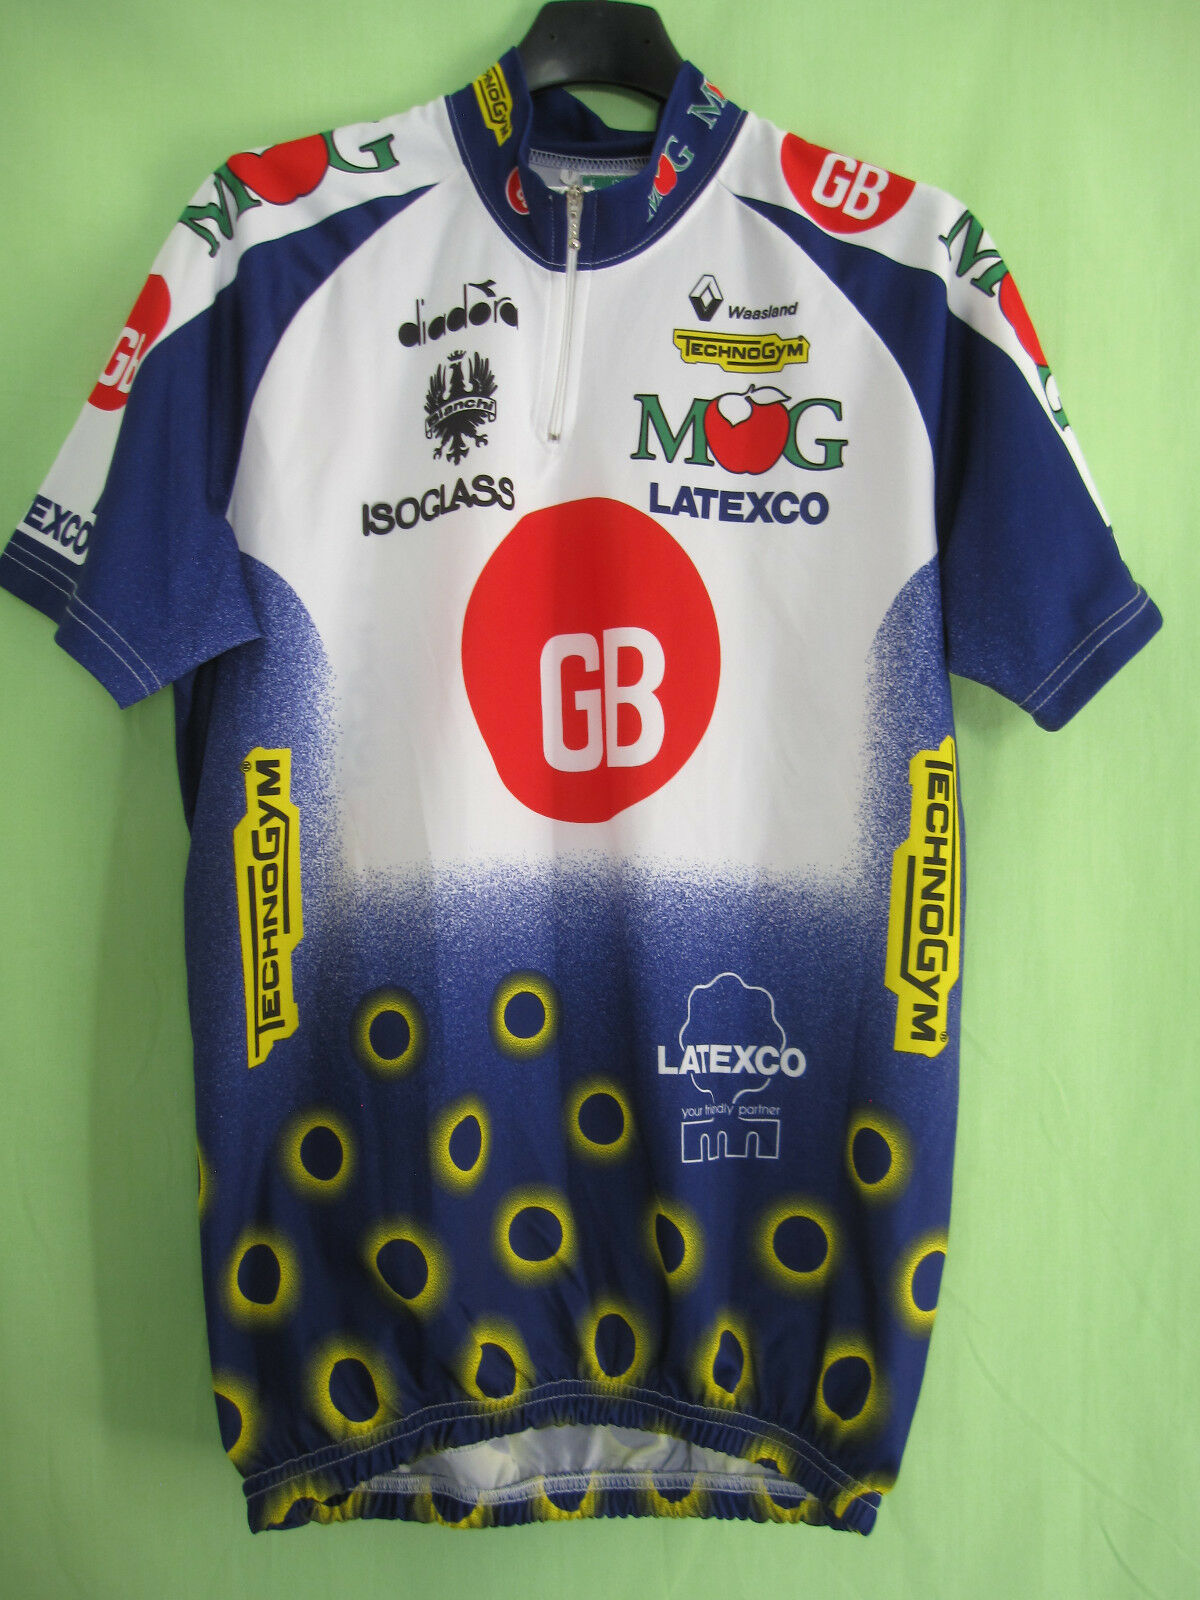 Maillot cycliste GB MG Boys Latexco Jersey cycling Diadora Vintage - 5   XL